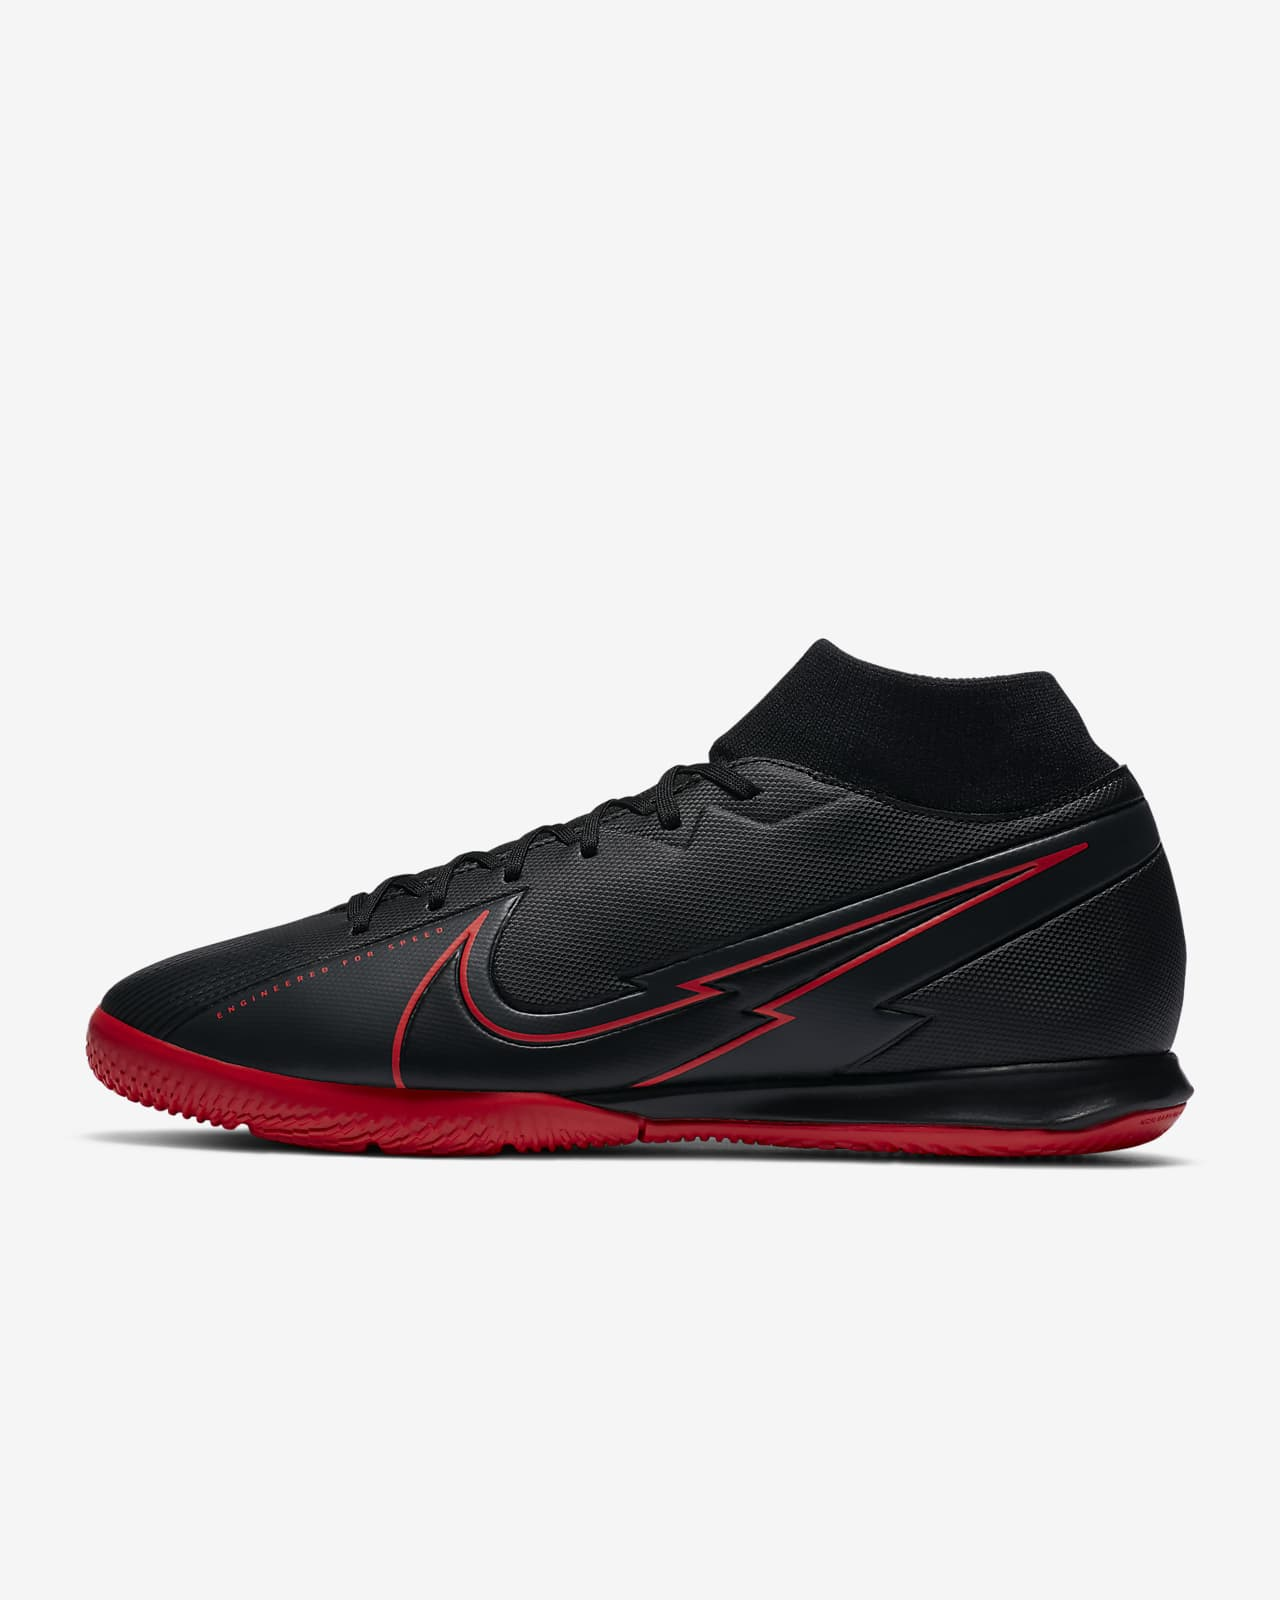 Nike Mercurial Superfly 7 Academy IC-fodboldsko (indendørs/bane)